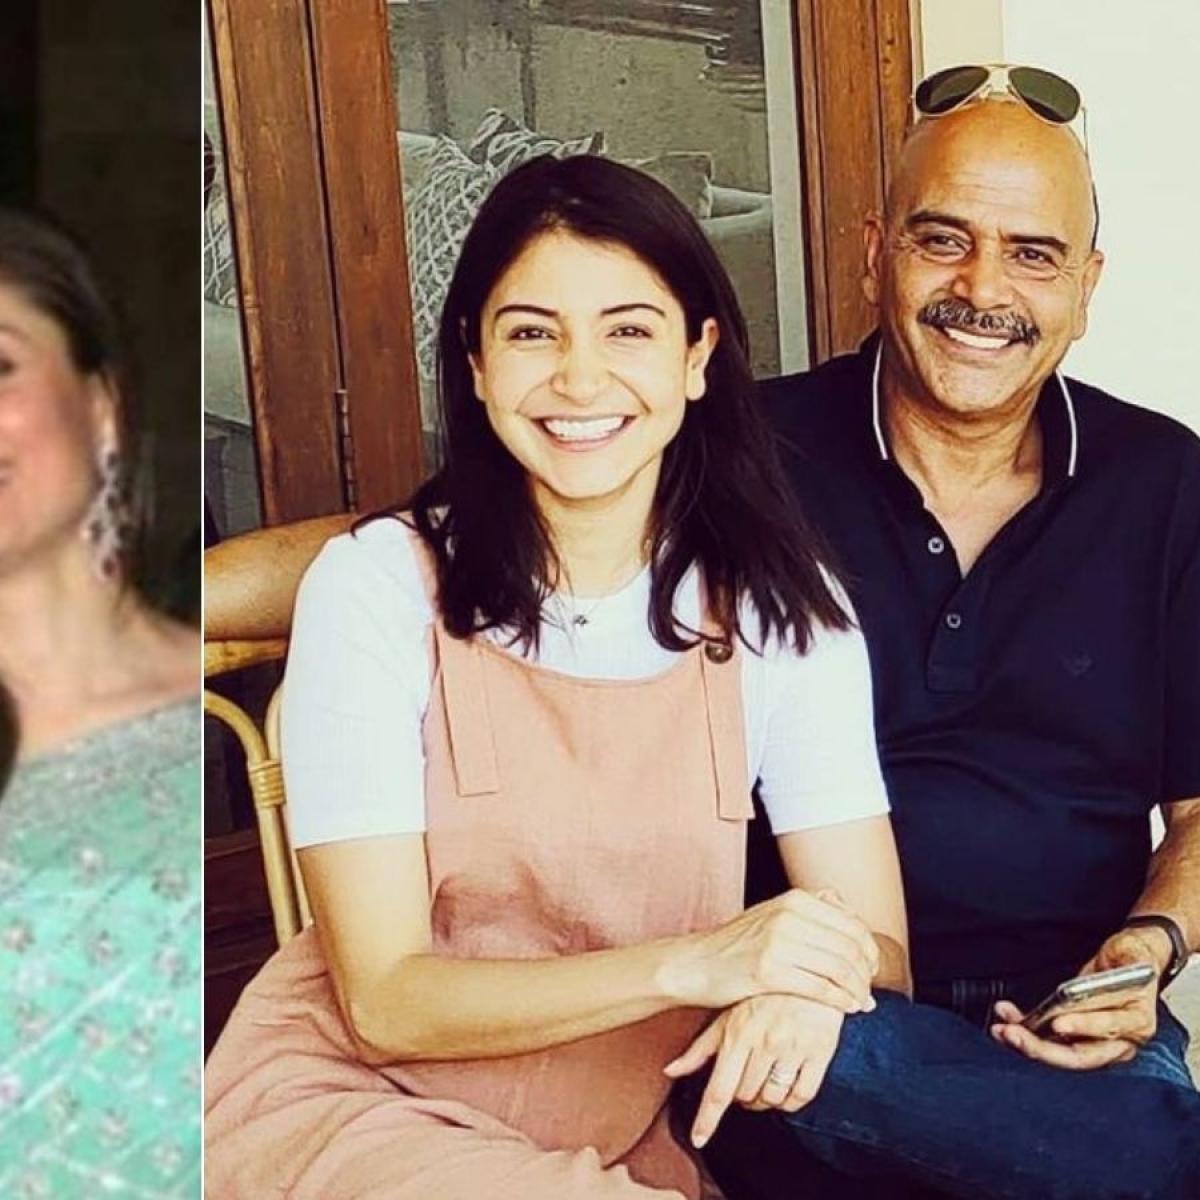 Kareena Kapoor Khan, Anushka Sharma, Karan Johar and other celebs extend Father's Day greetings